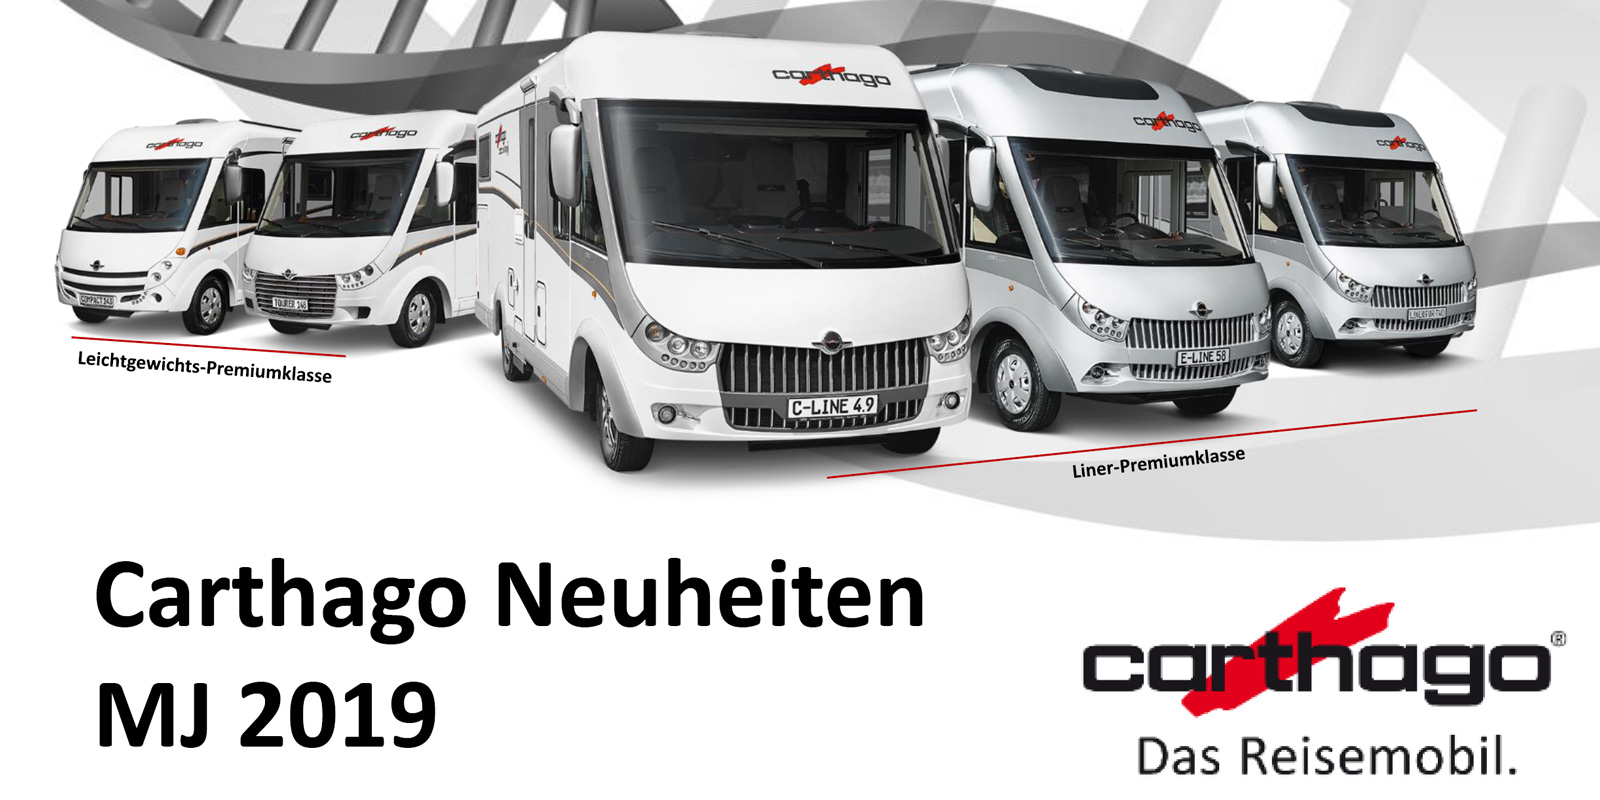 0b252310d6 Carthago Modellneuheiten 2019 - Campingworld Neugebauer